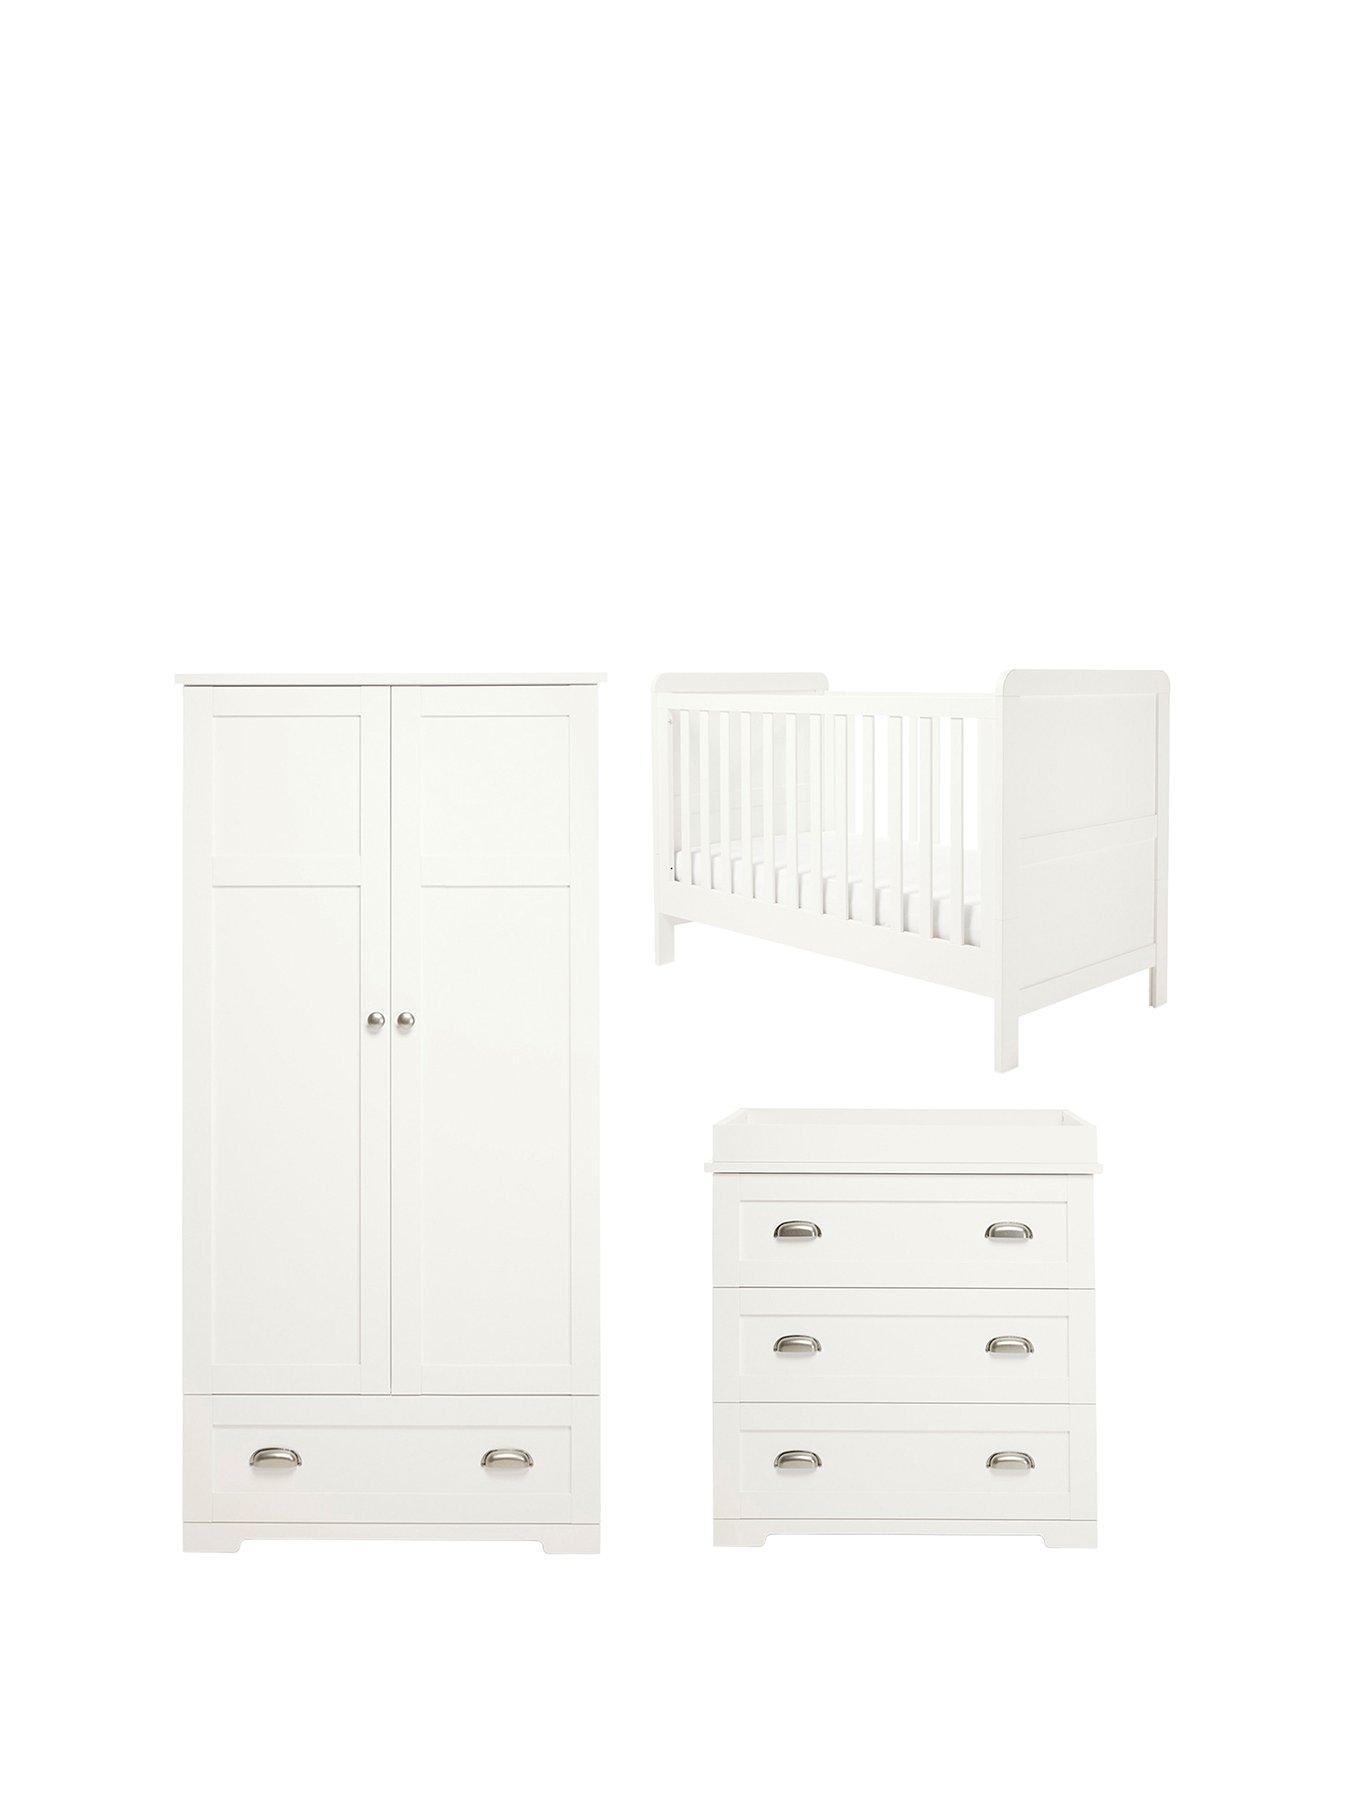 Mamas U0026 Papas Shipley Cot Bed, Dresser U0026 Wardrobe | Very.co.uk